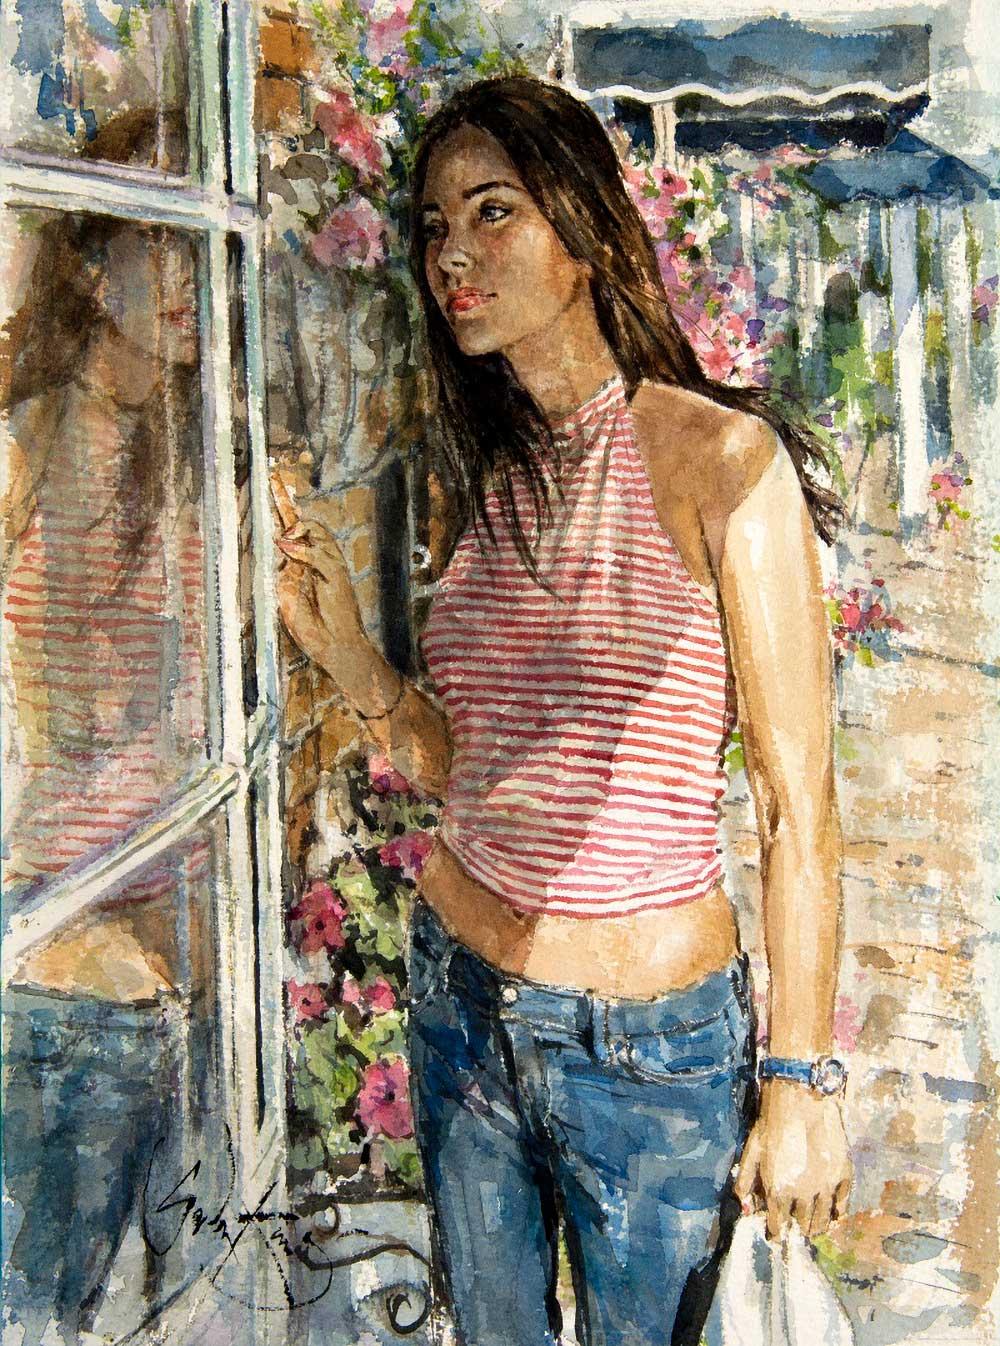 Inspirational Art : Window Shopping by Gordon King